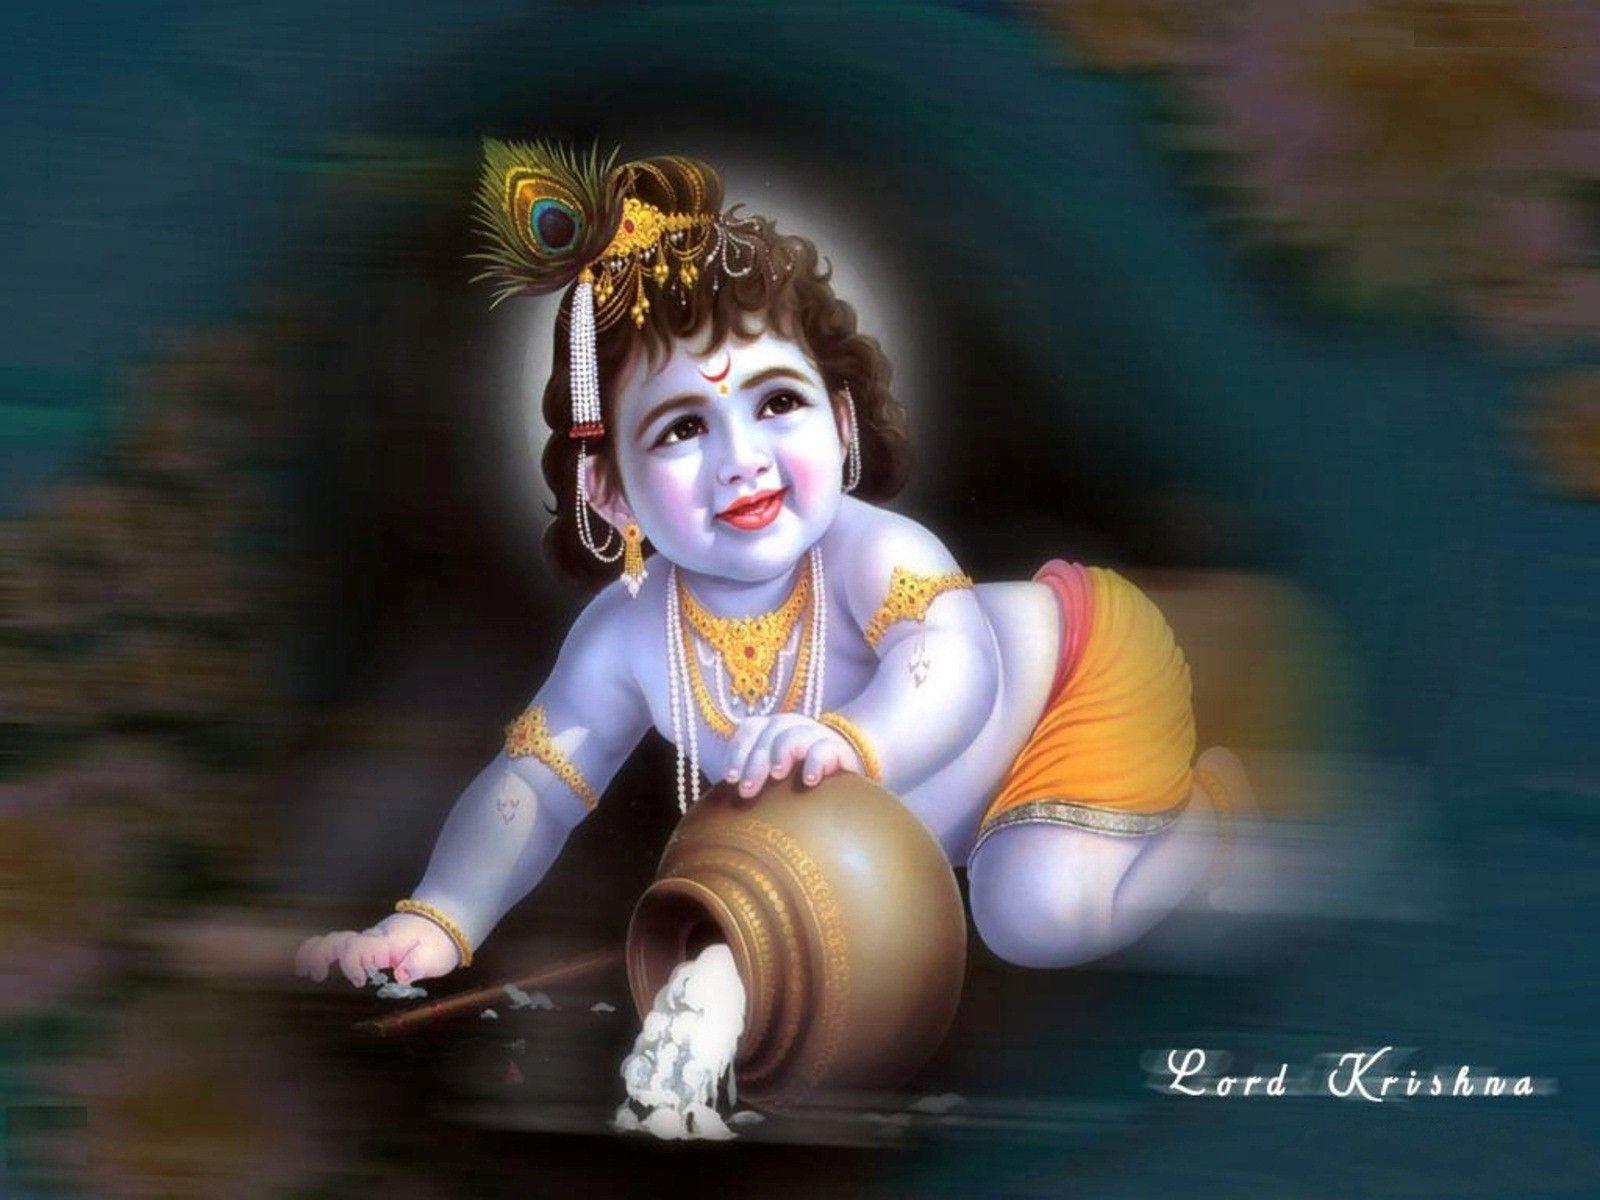 High Definition 1280x720 Baby Krishna Pic Google Search Lord Krishna Images Krishna Images Krishna Wallpaper